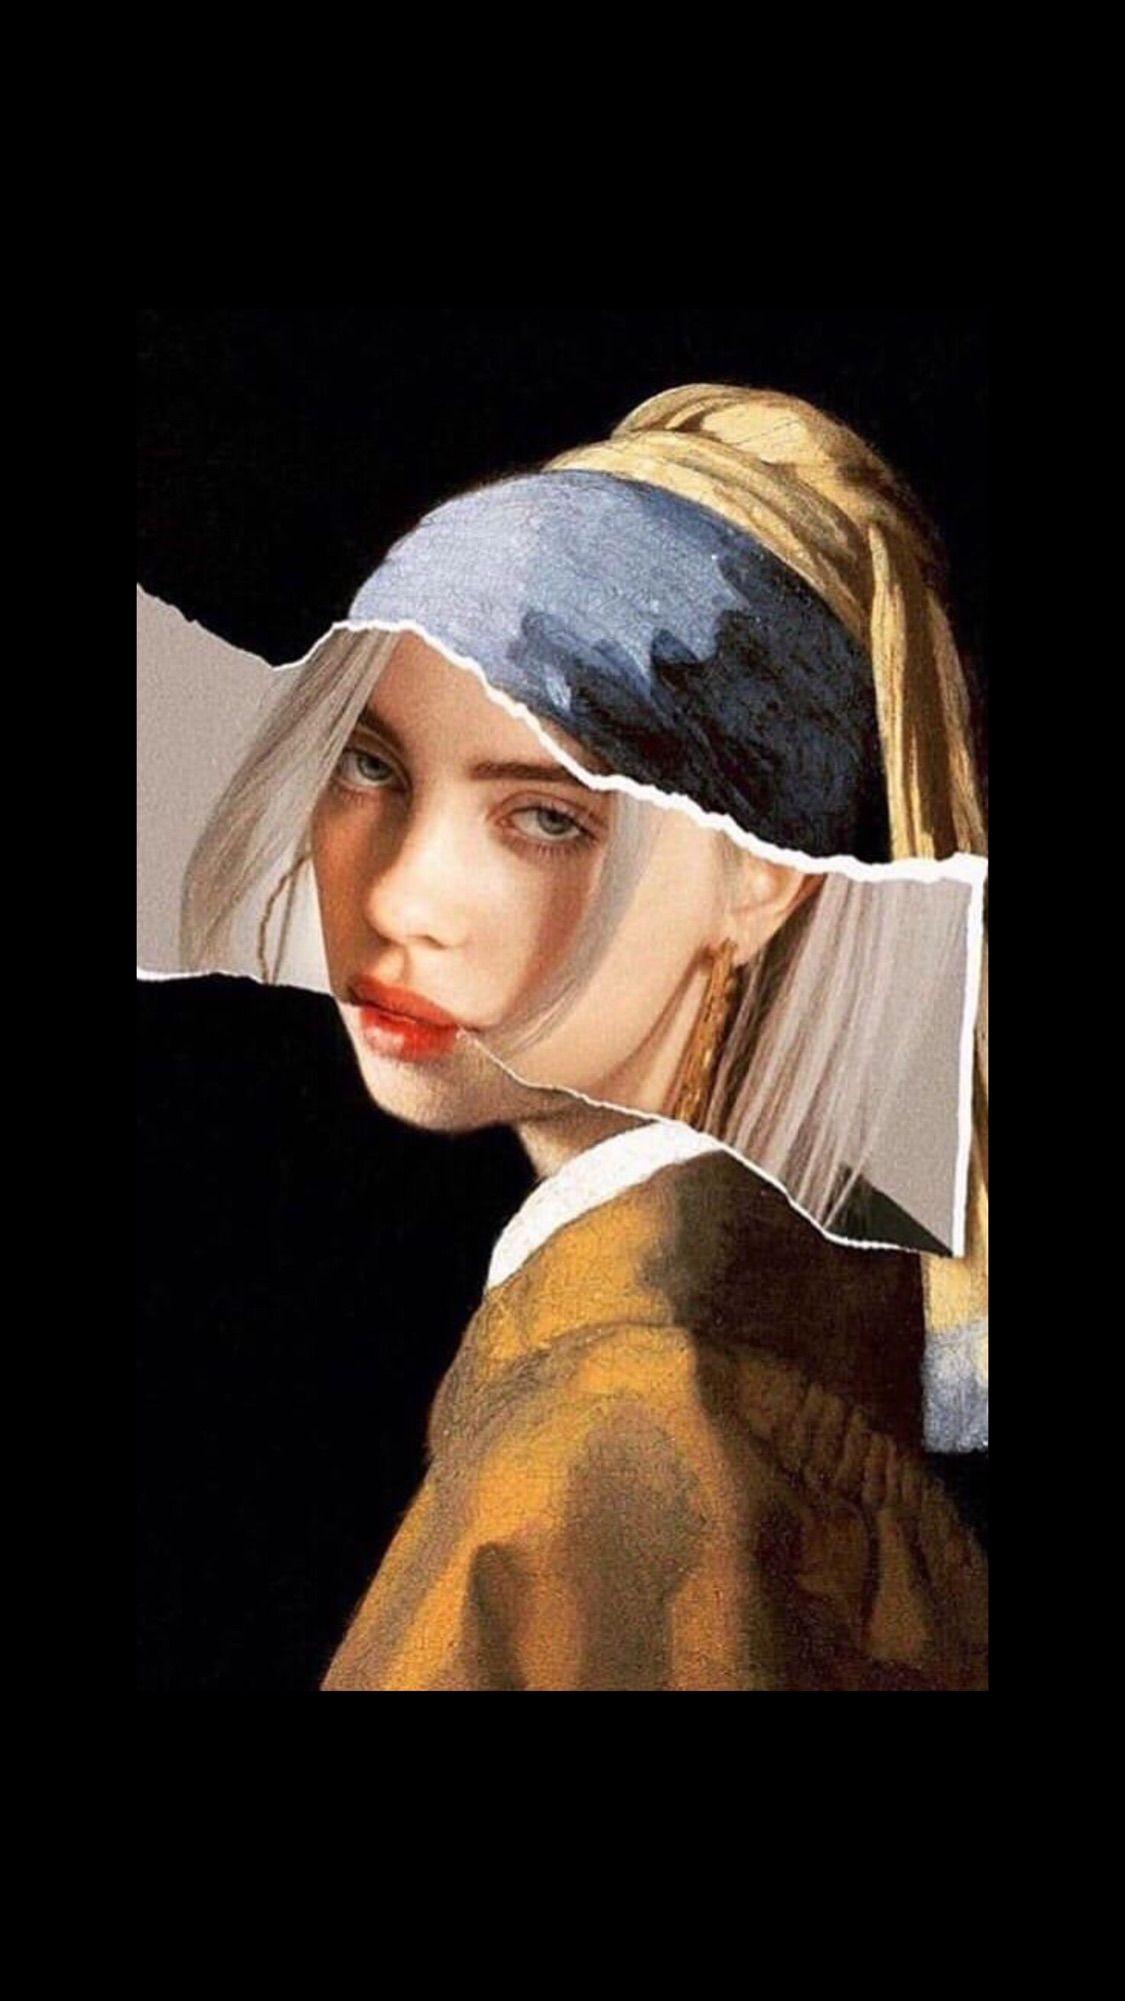 Pin by Онищенко Анжелика on Фотографии | Artwork, Mona, Art